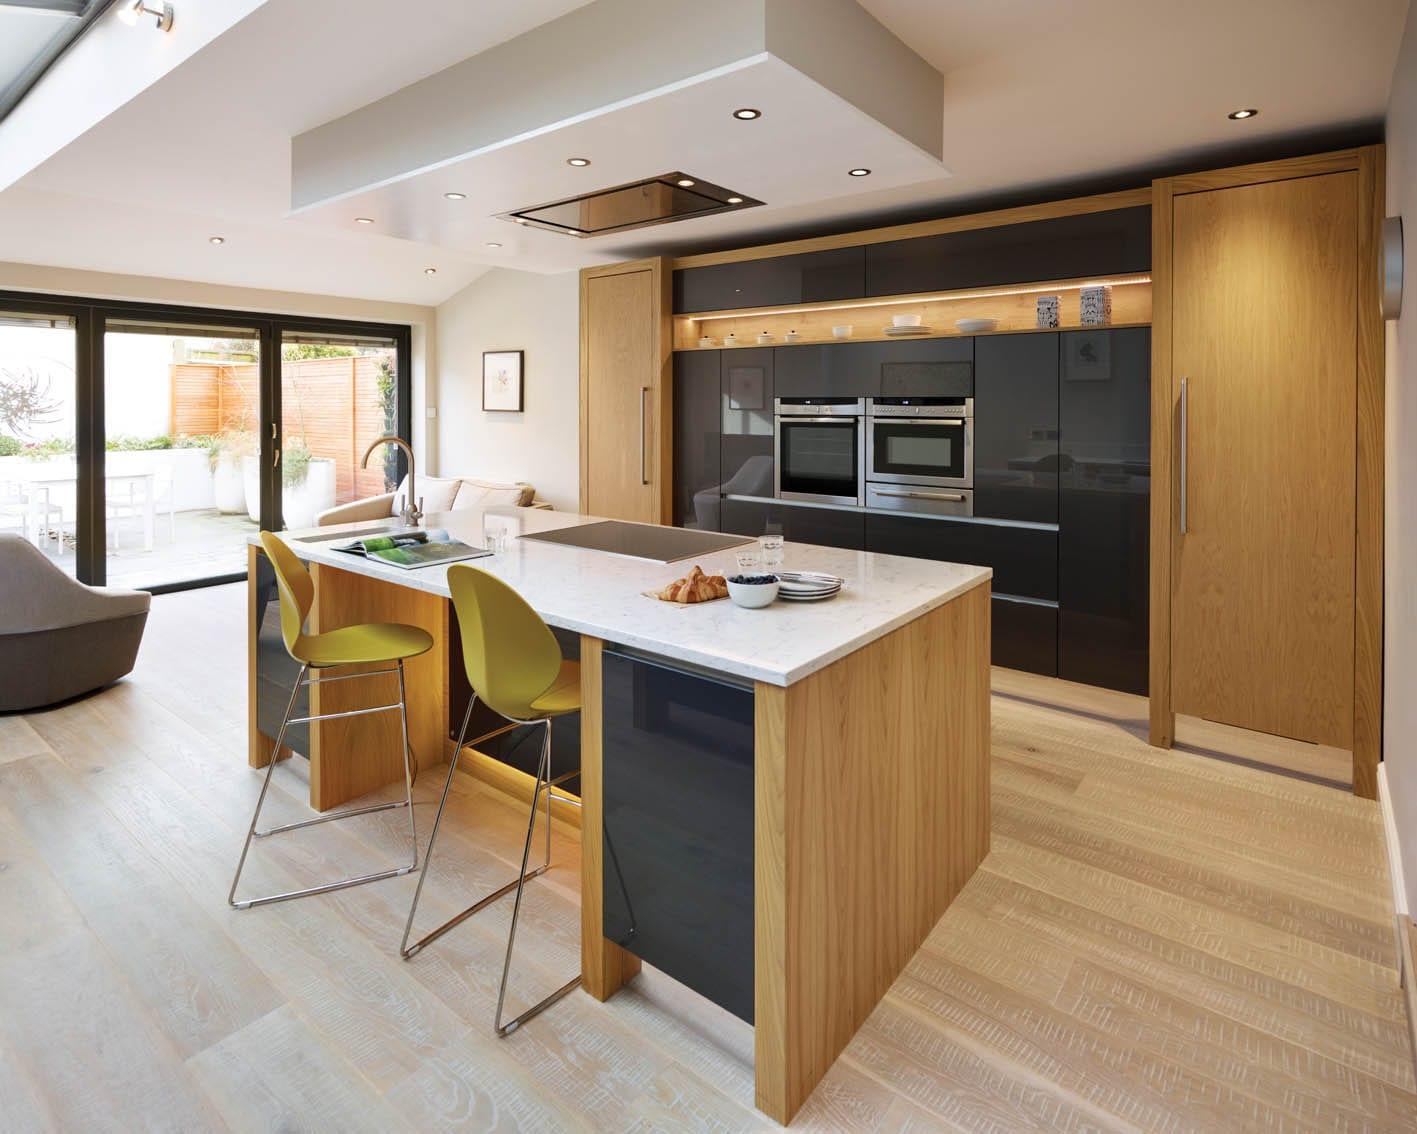 Modern Kitchen With Wooden Finish